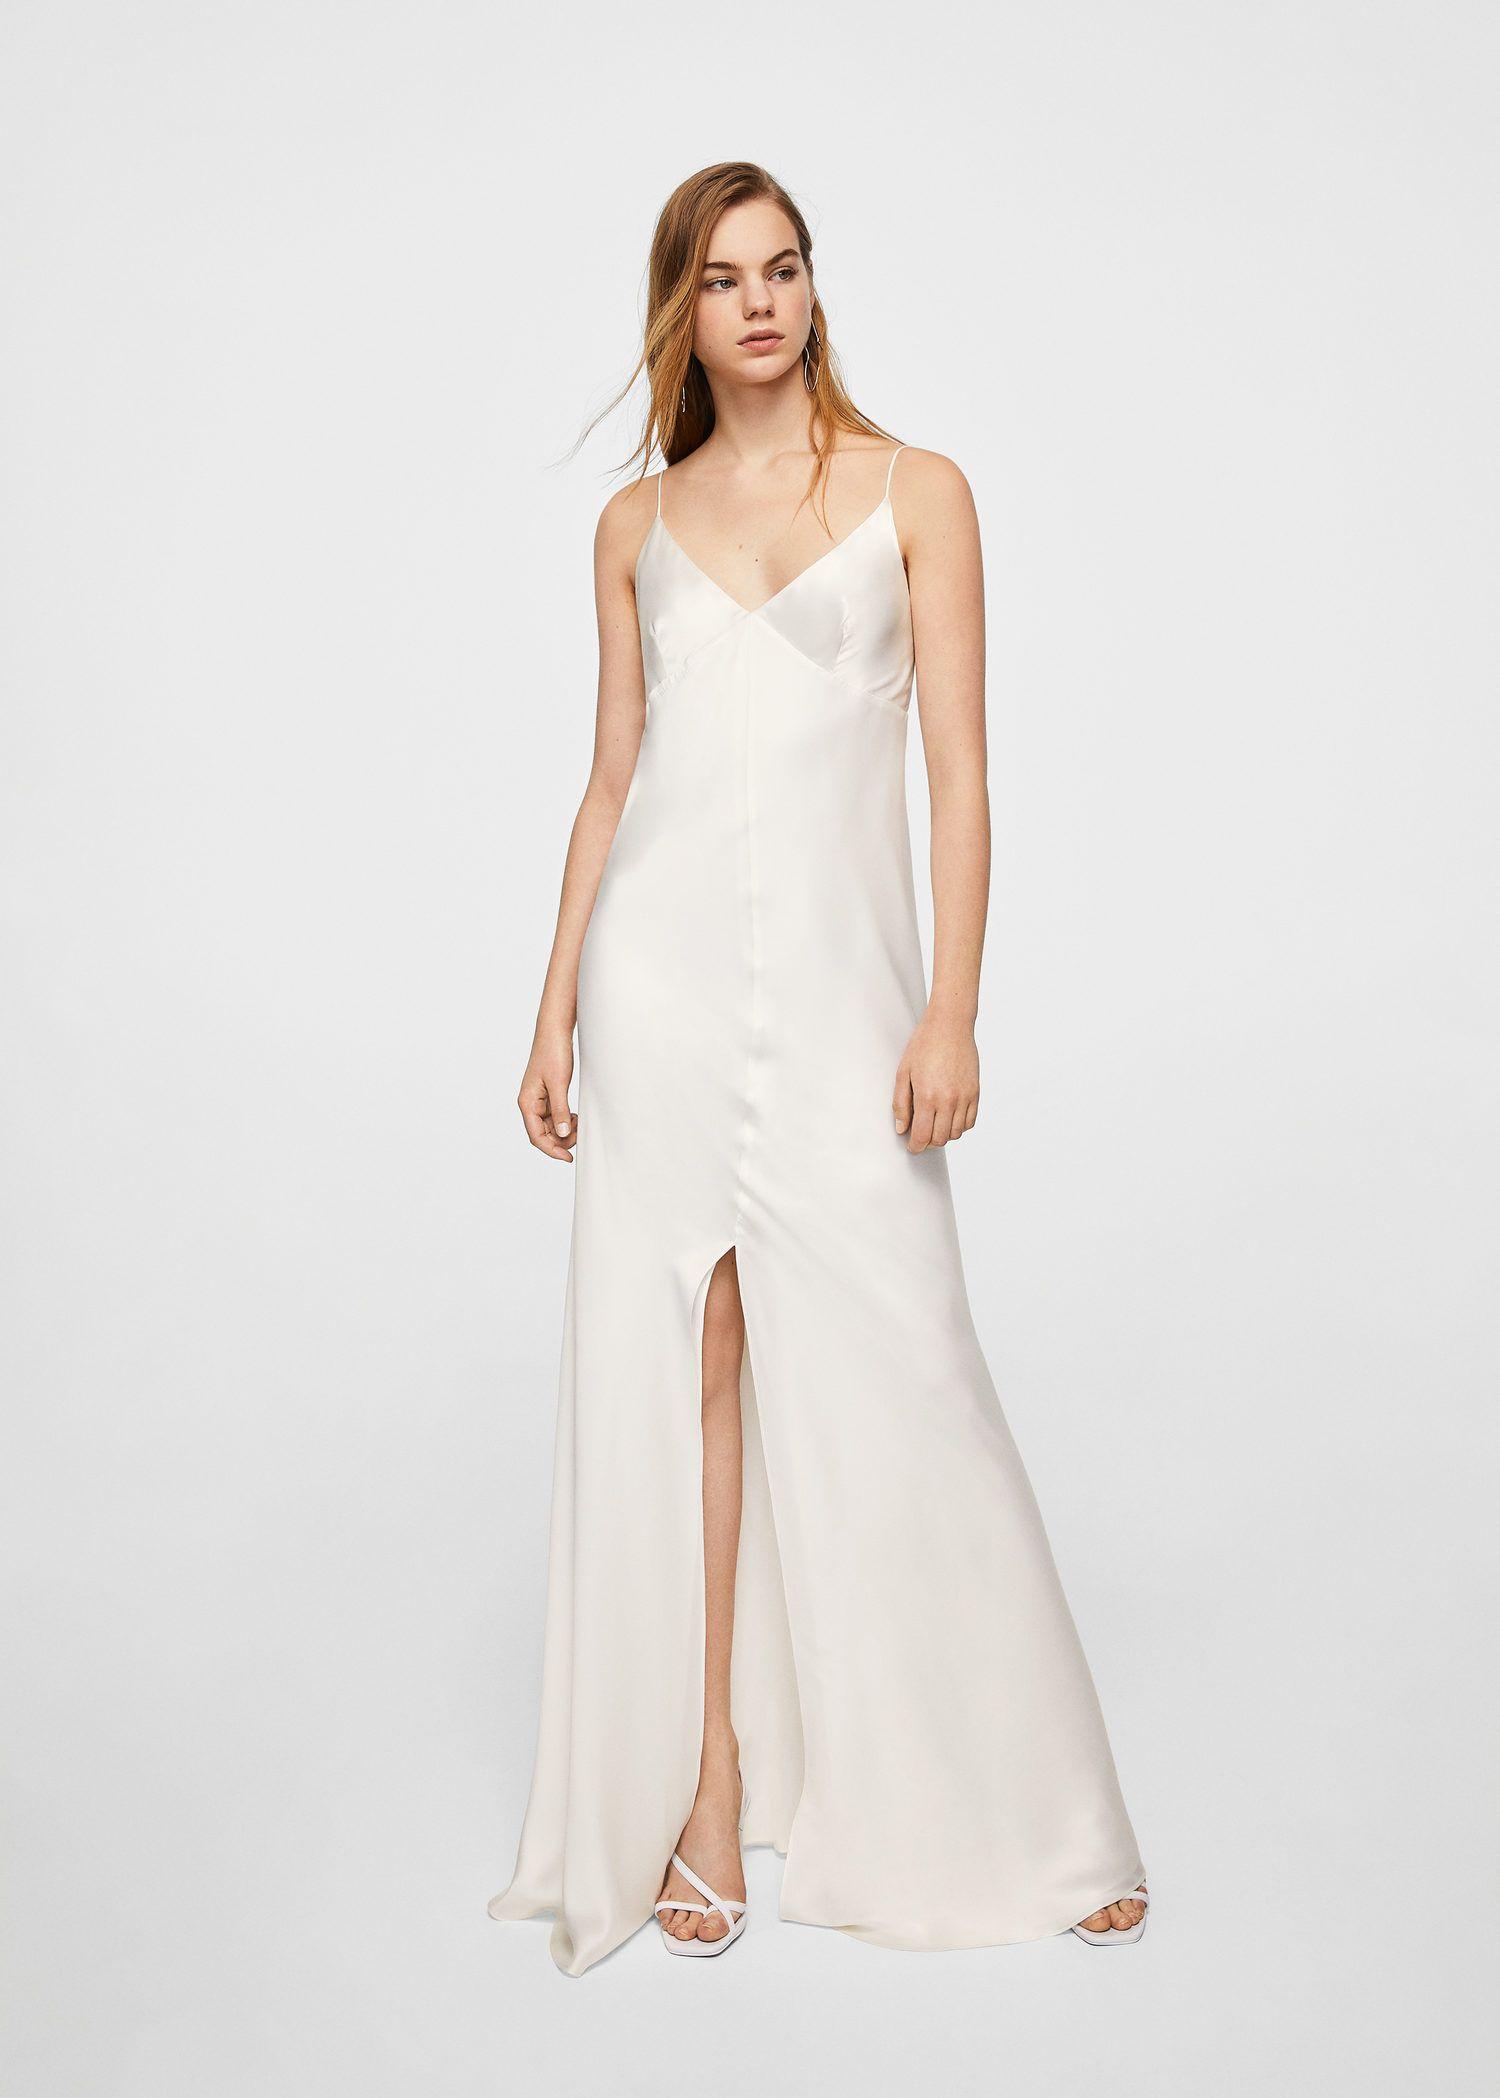 Vestidos de novia para primavera